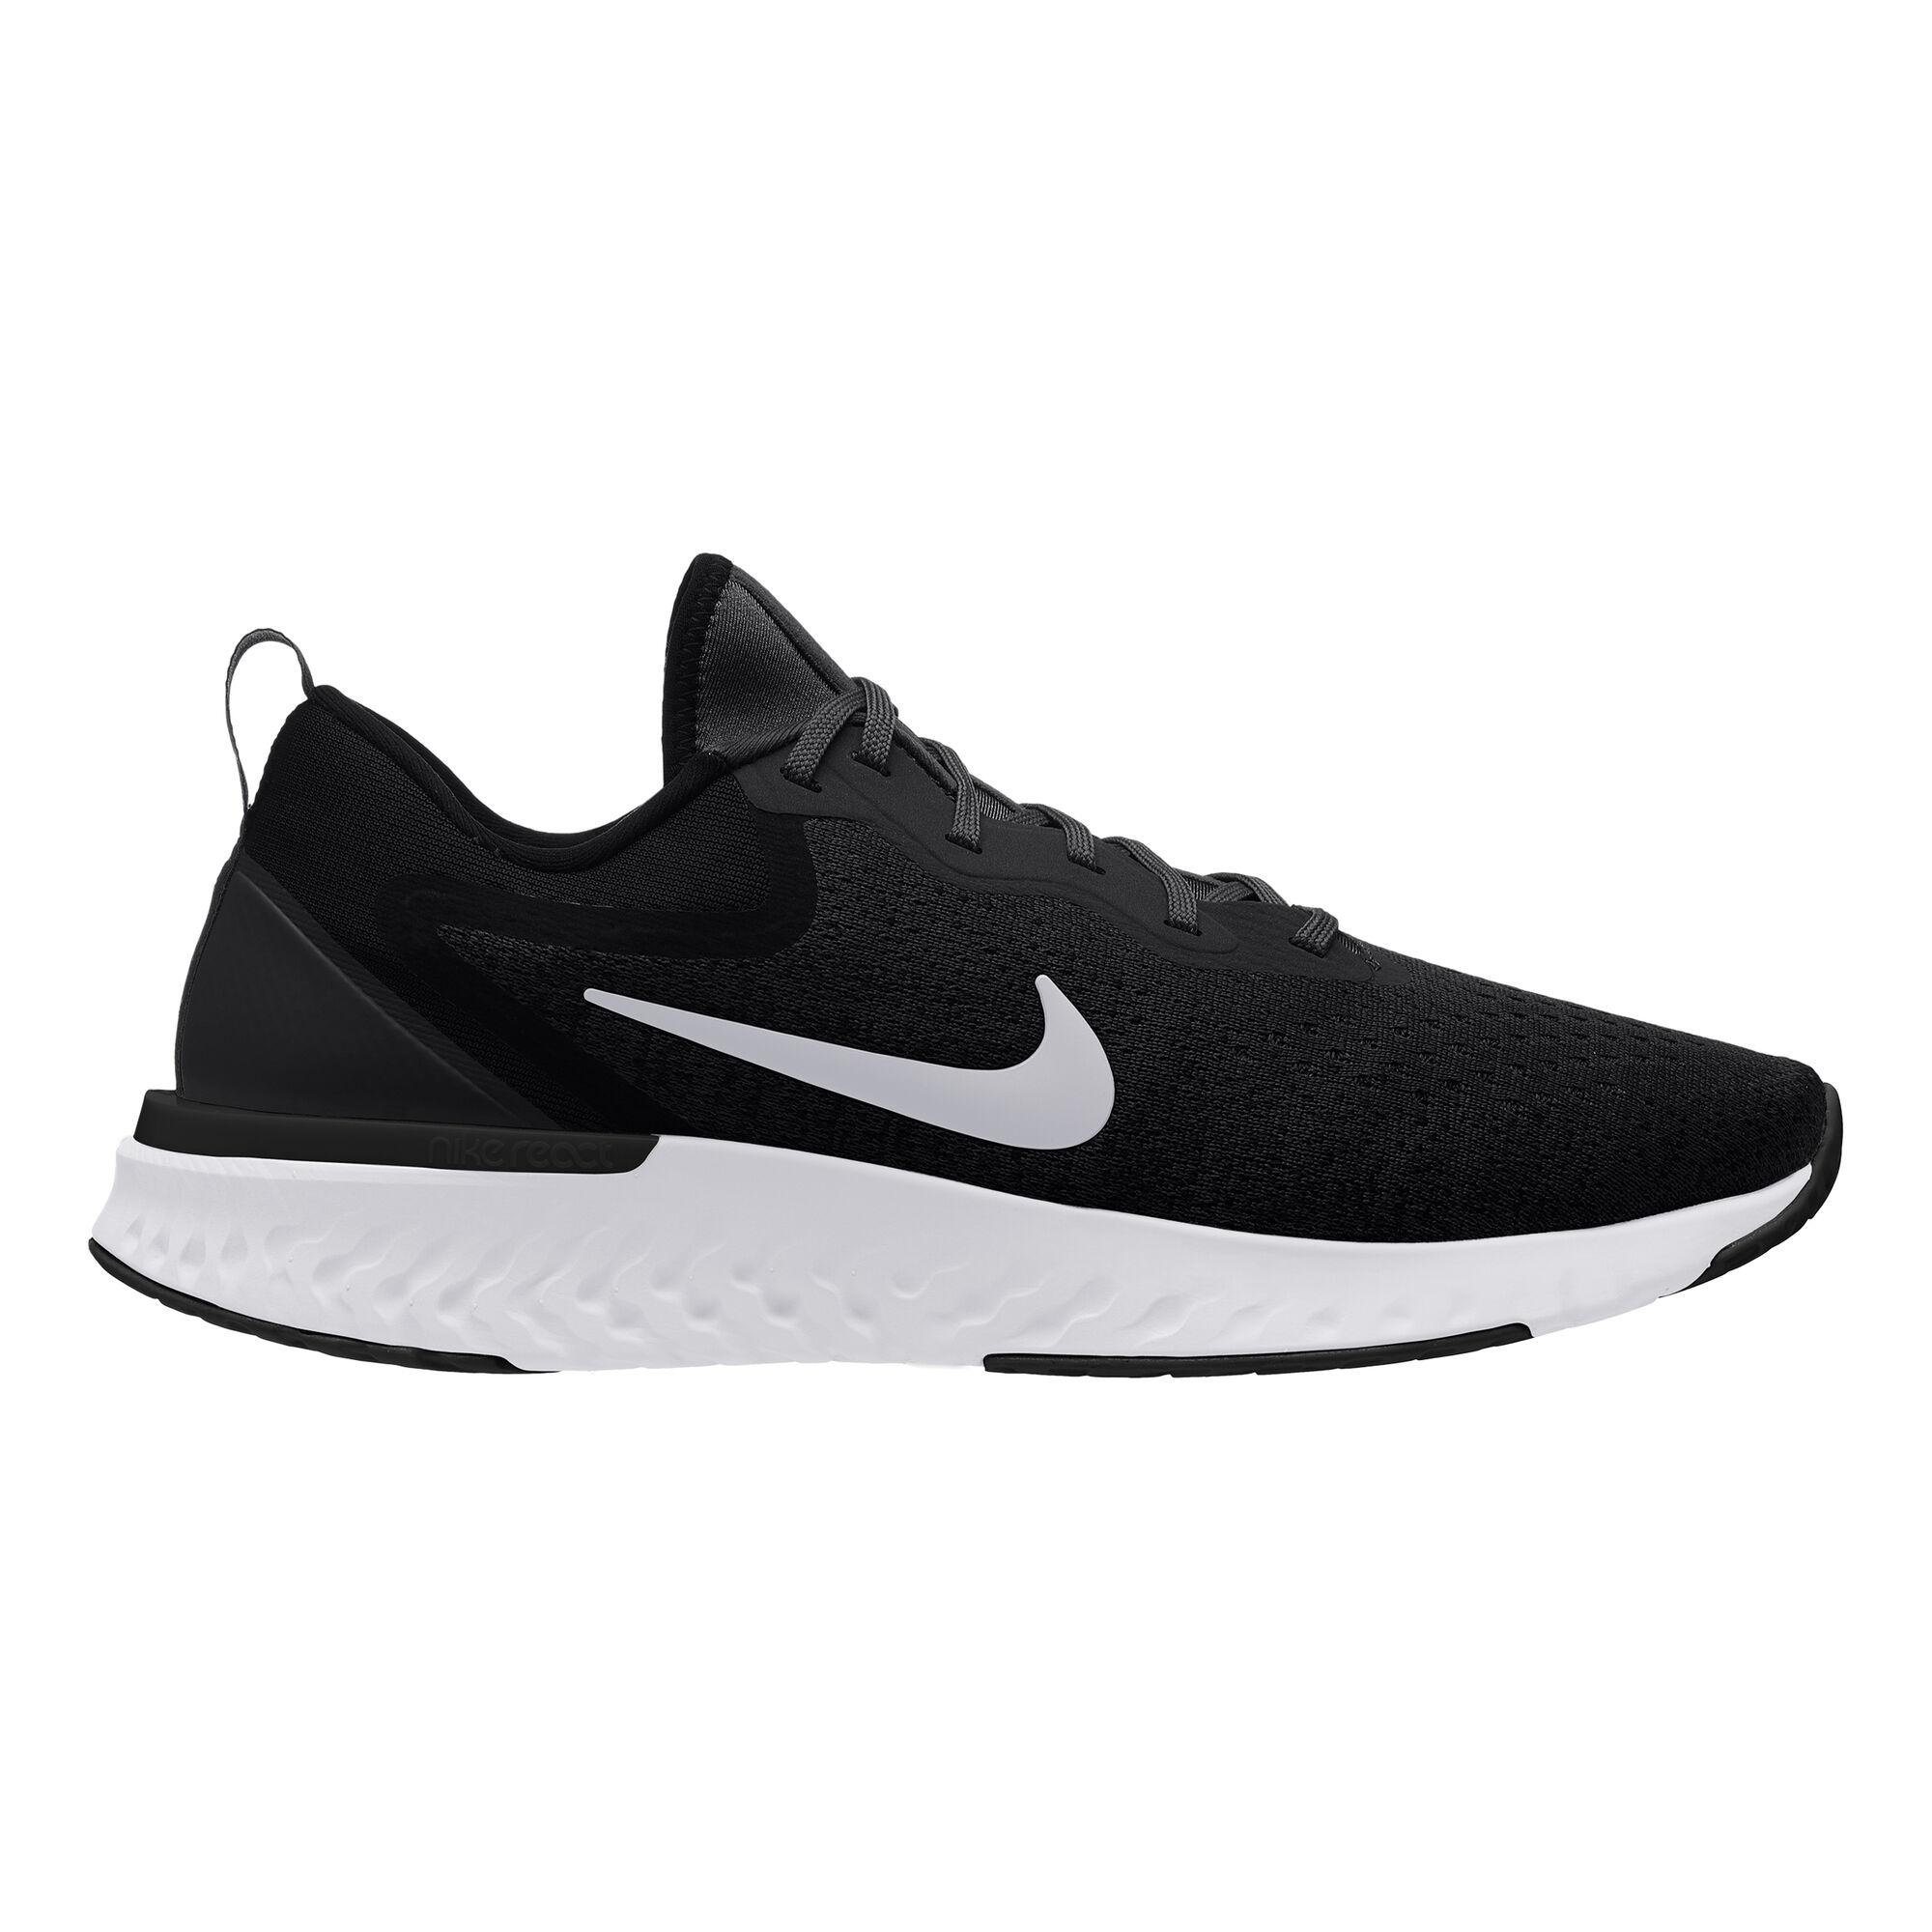 fb5639e92baf buy Nike Odyssey React Neutral Running Shoe Men - Black